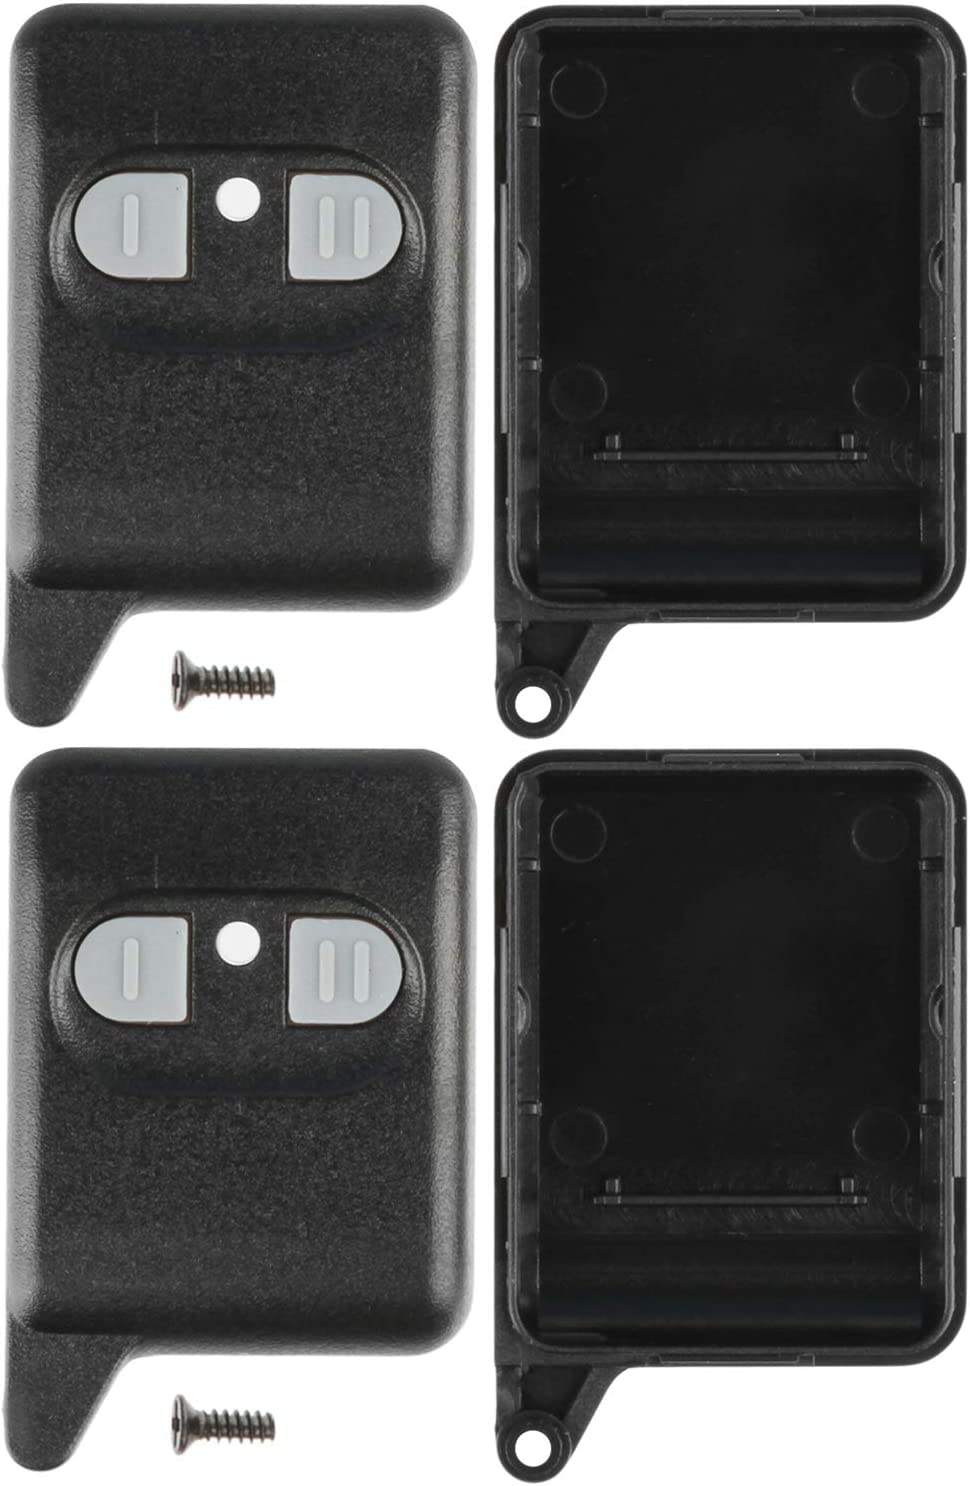 KeylessOption Keyless Entry Remote Fob Aftermarket Alarm Shell Case Cover For Viper Hornet Valet EZSDEI471 (Pack of 2)